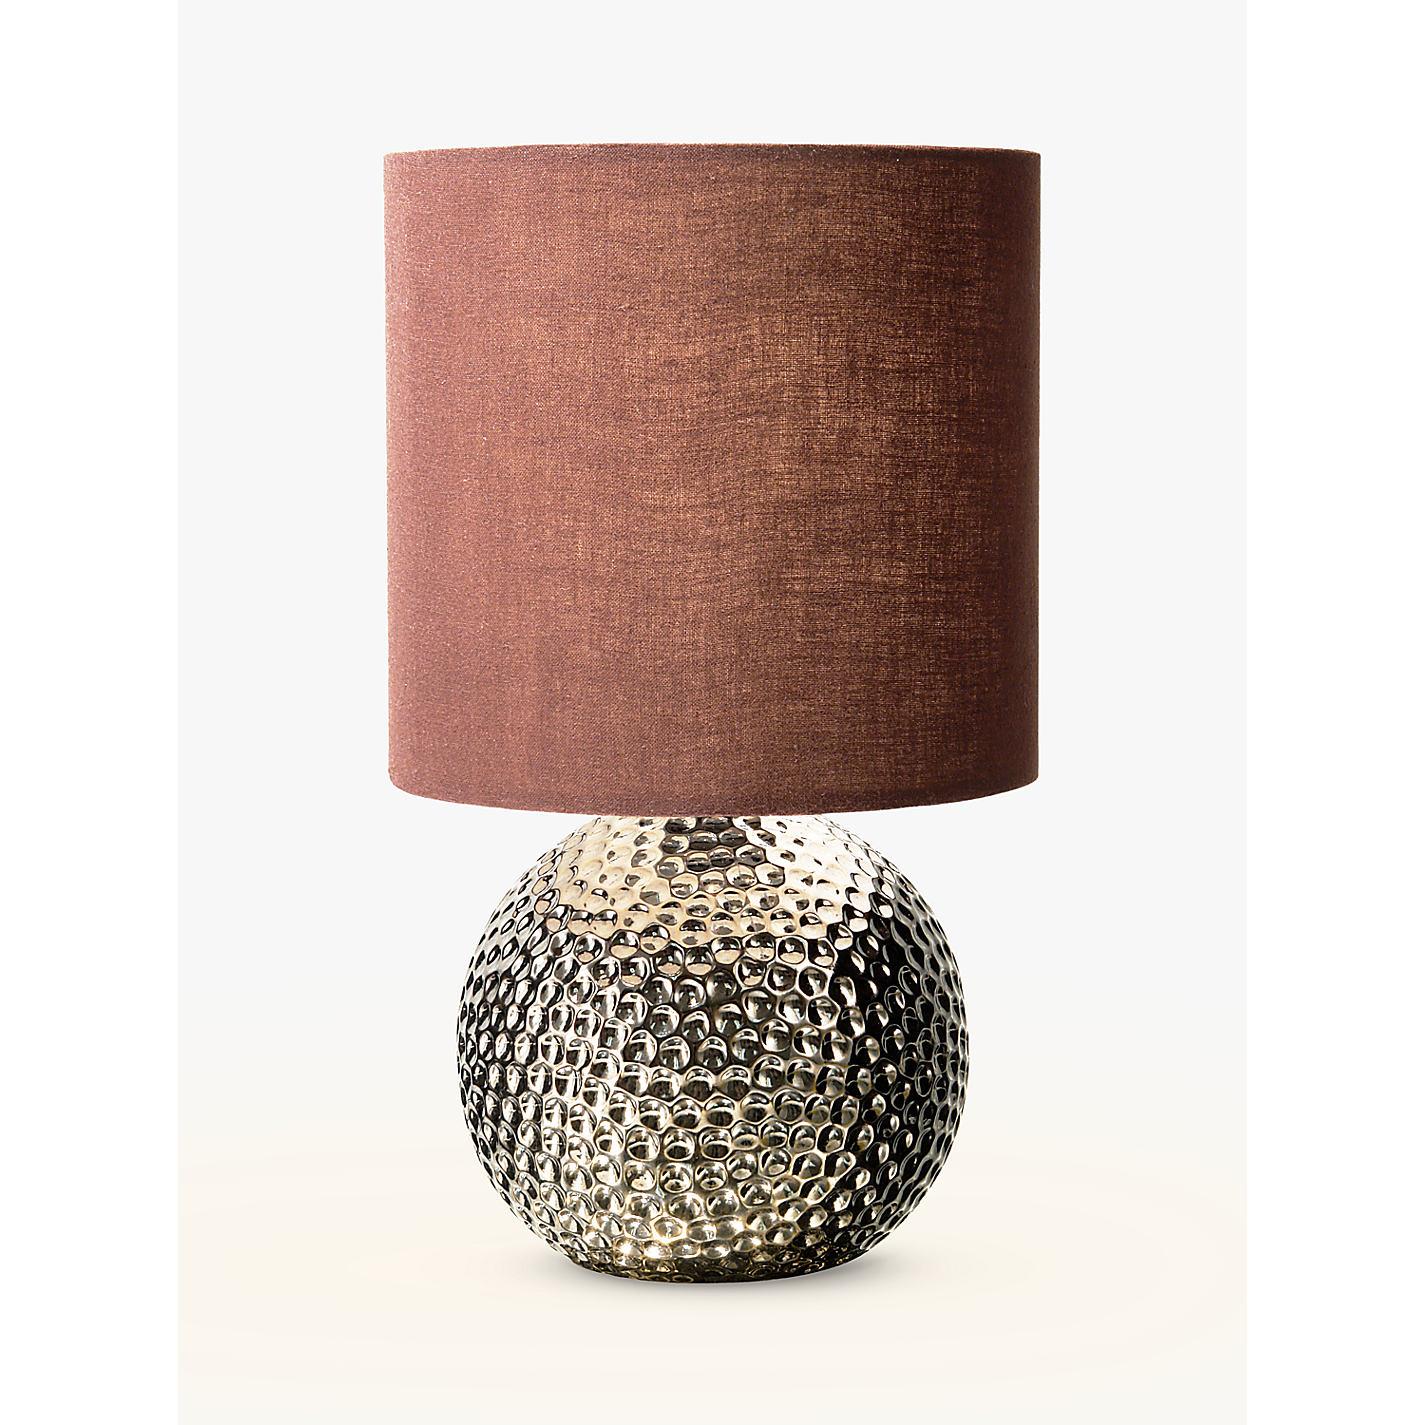 Buy john lewis alisa table lamp bronze john lewis buy john lewis alisa table lamp bronze online at johnlewis geotapseo Image collections